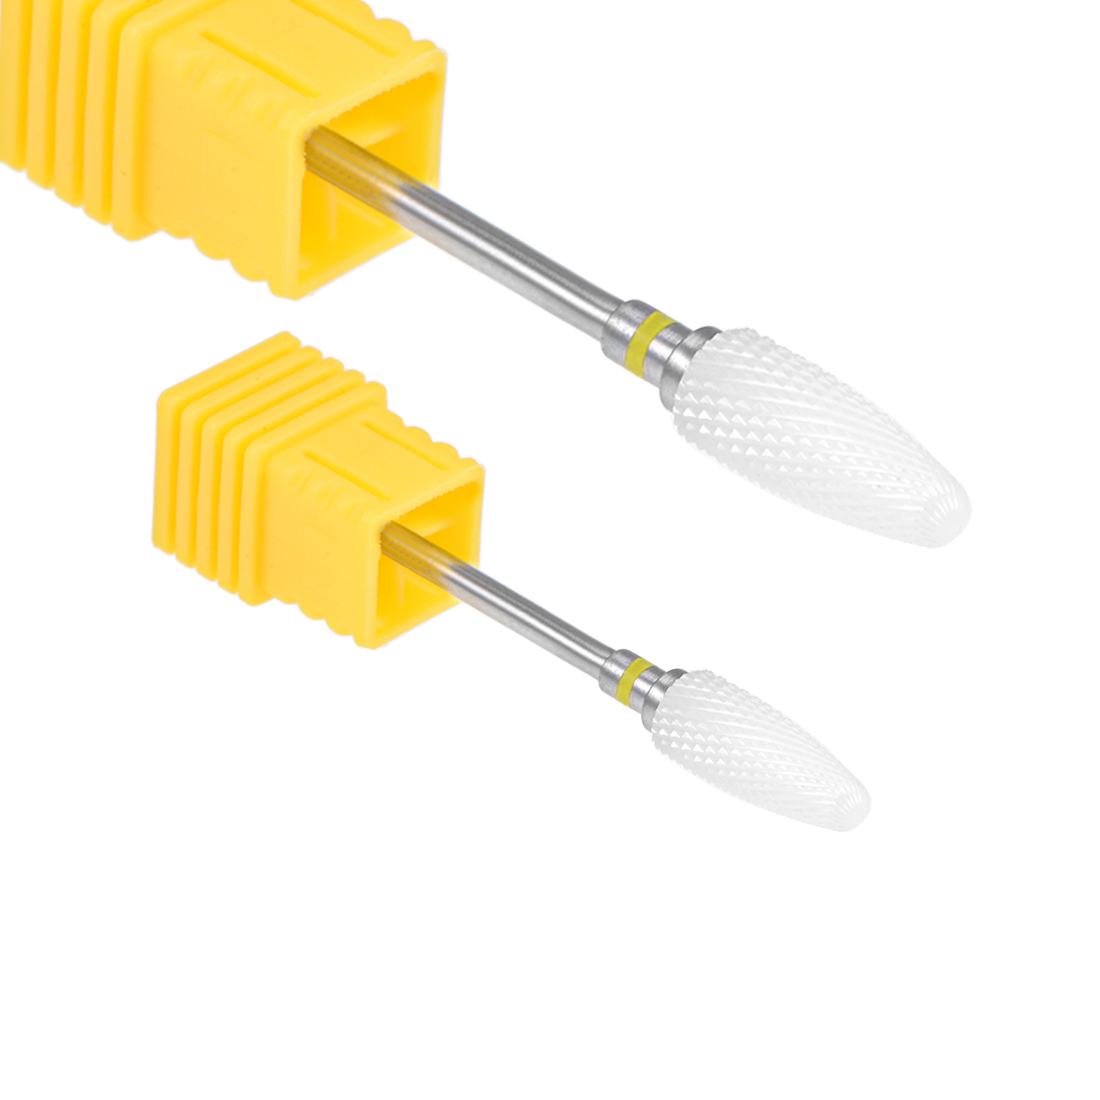 2pcs Ceramic Nail Drill Bits 3/32 inch (Extra Fine Grit) Cuticle Gel Remove